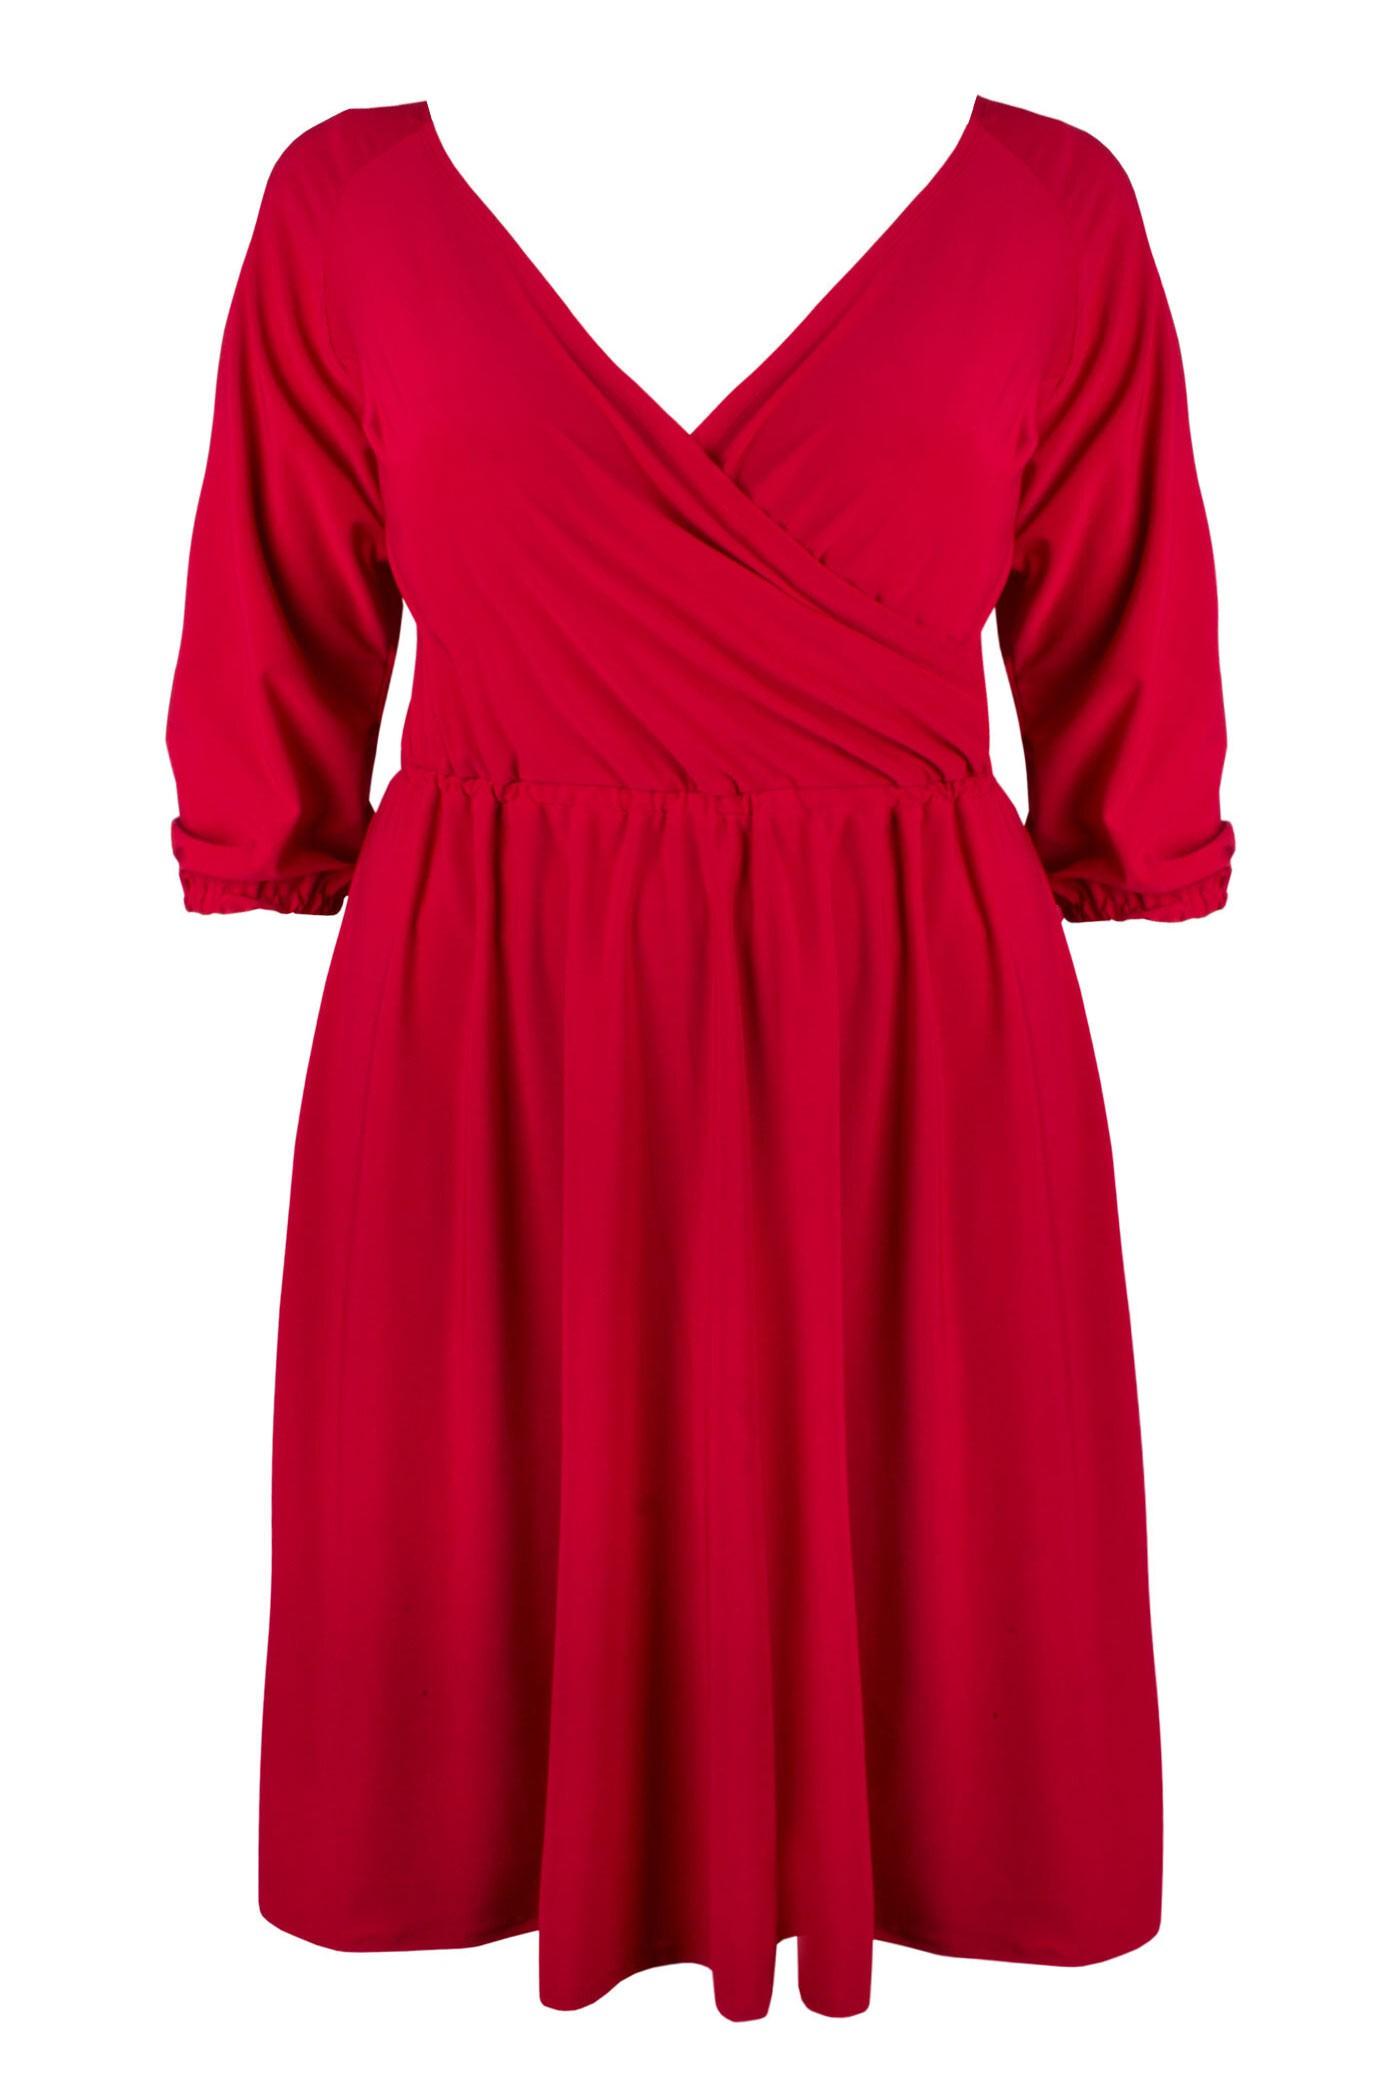 SHEILA RED elegancka sukienka plus size